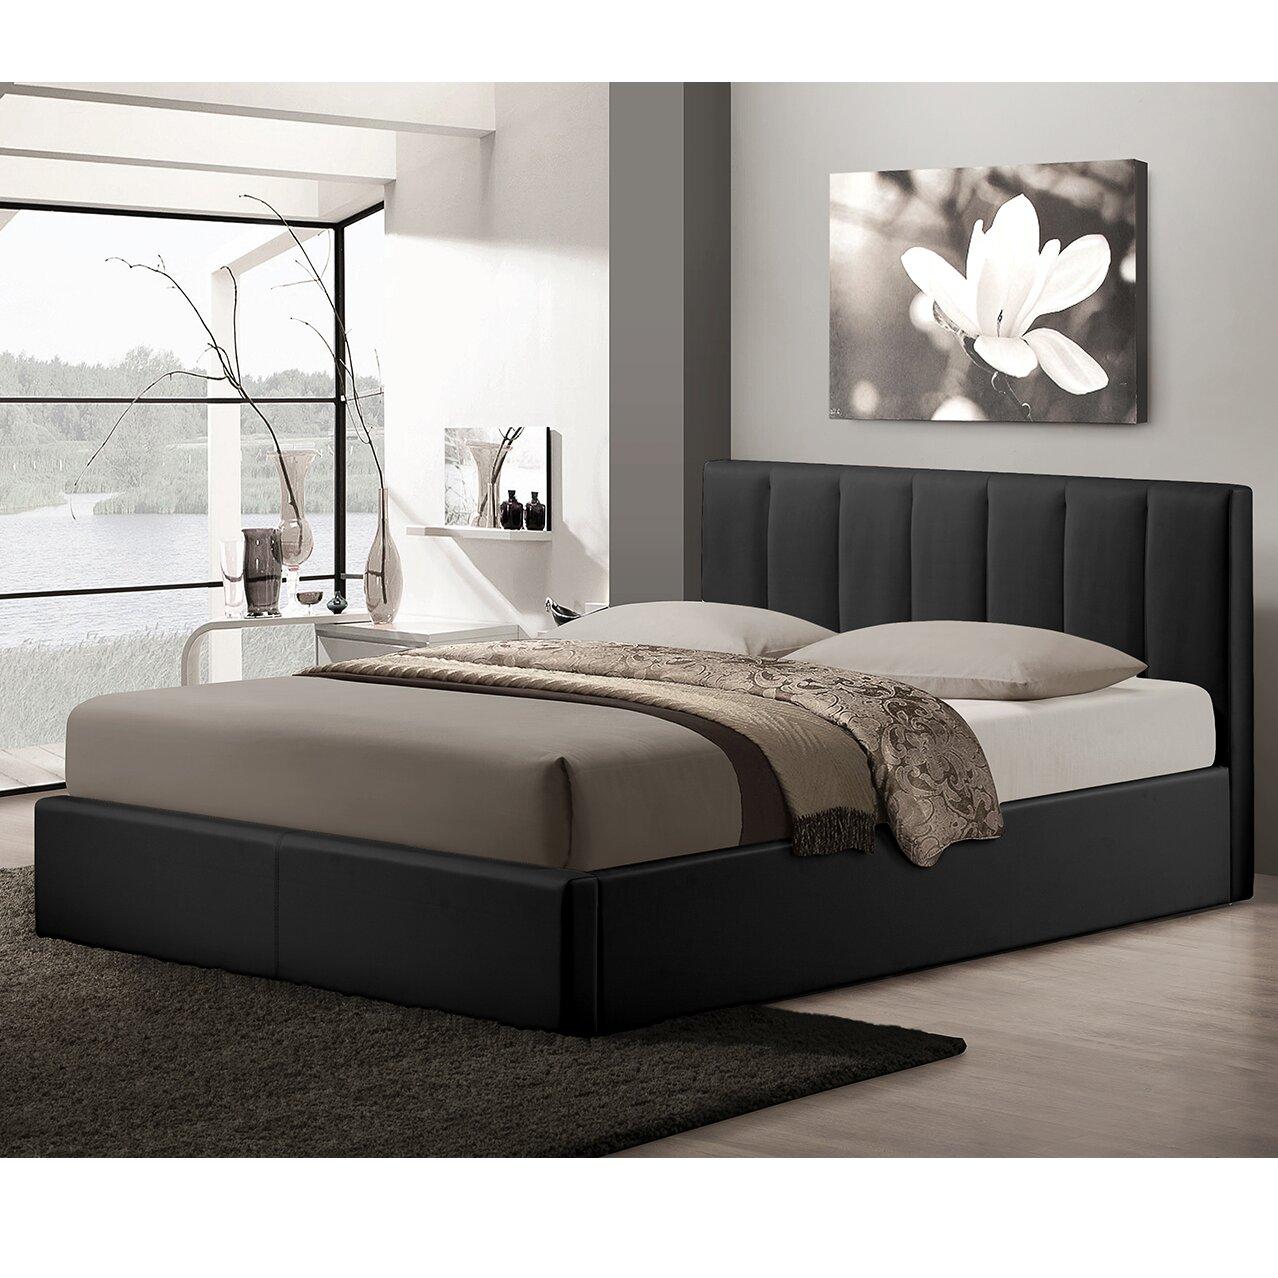 Wholesale Interiors Baxton Studio Queen Upholstered Storage Platform Bed Reviews